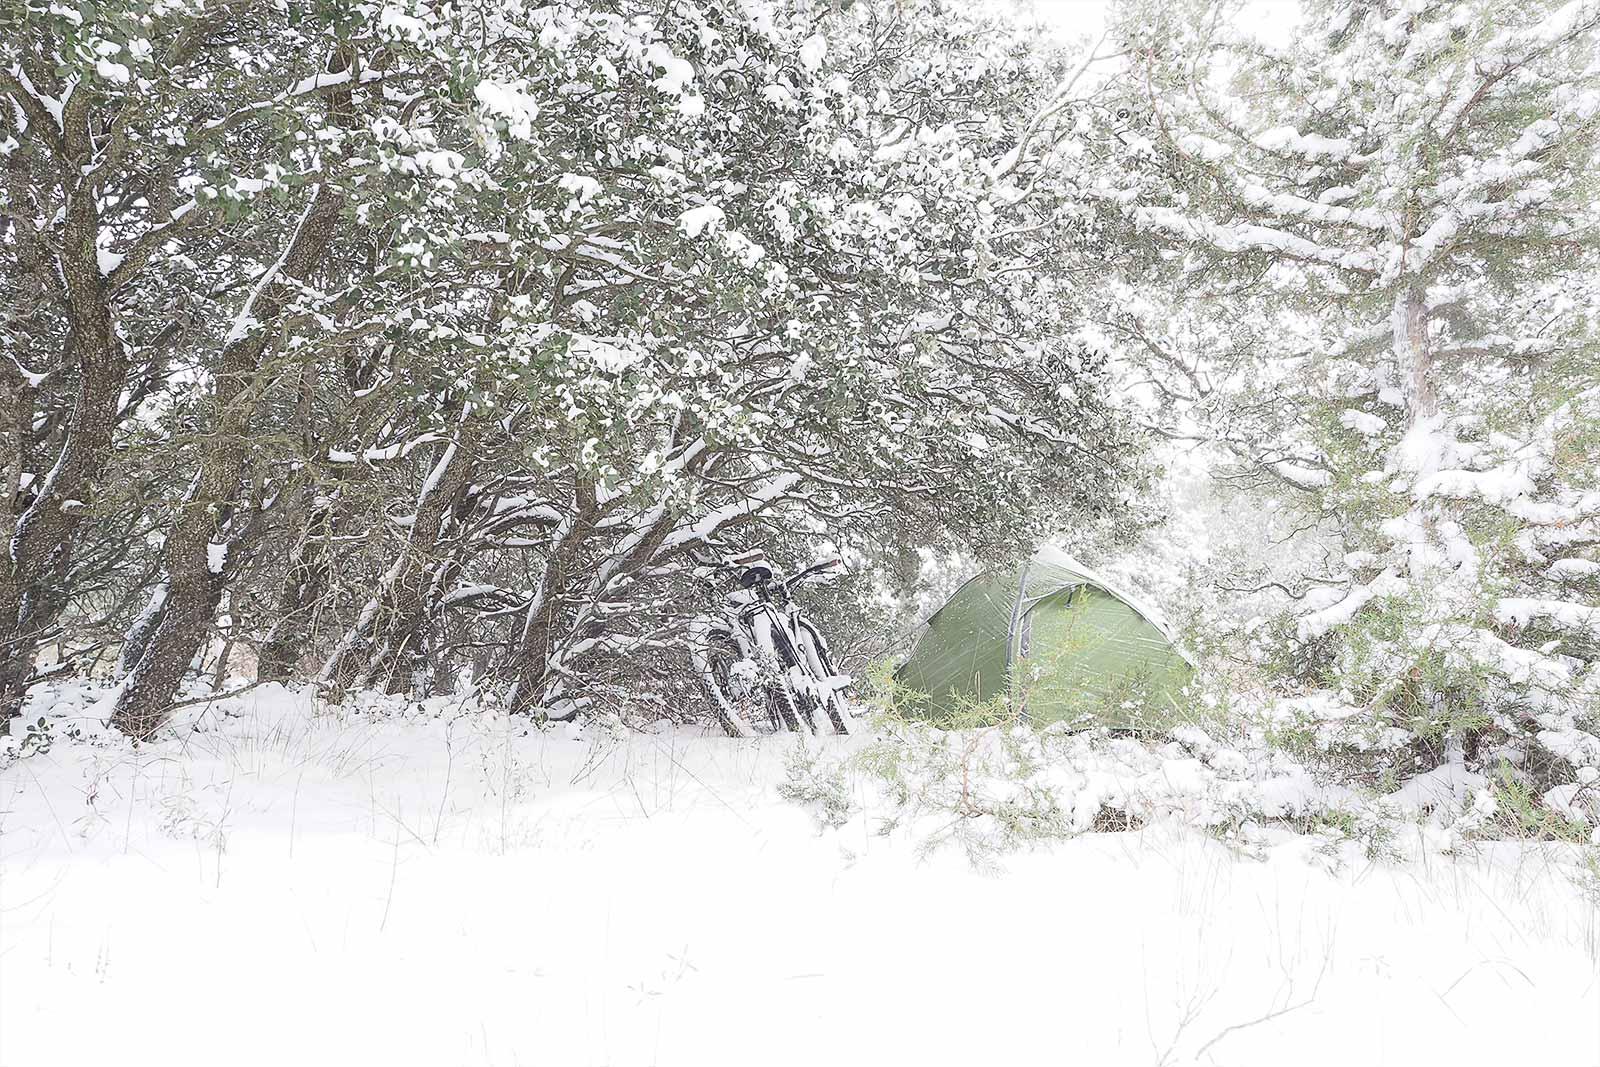 bivouac-orion-exped-tent-bici-tormenta-filomena-enero-2021-yoniquenews